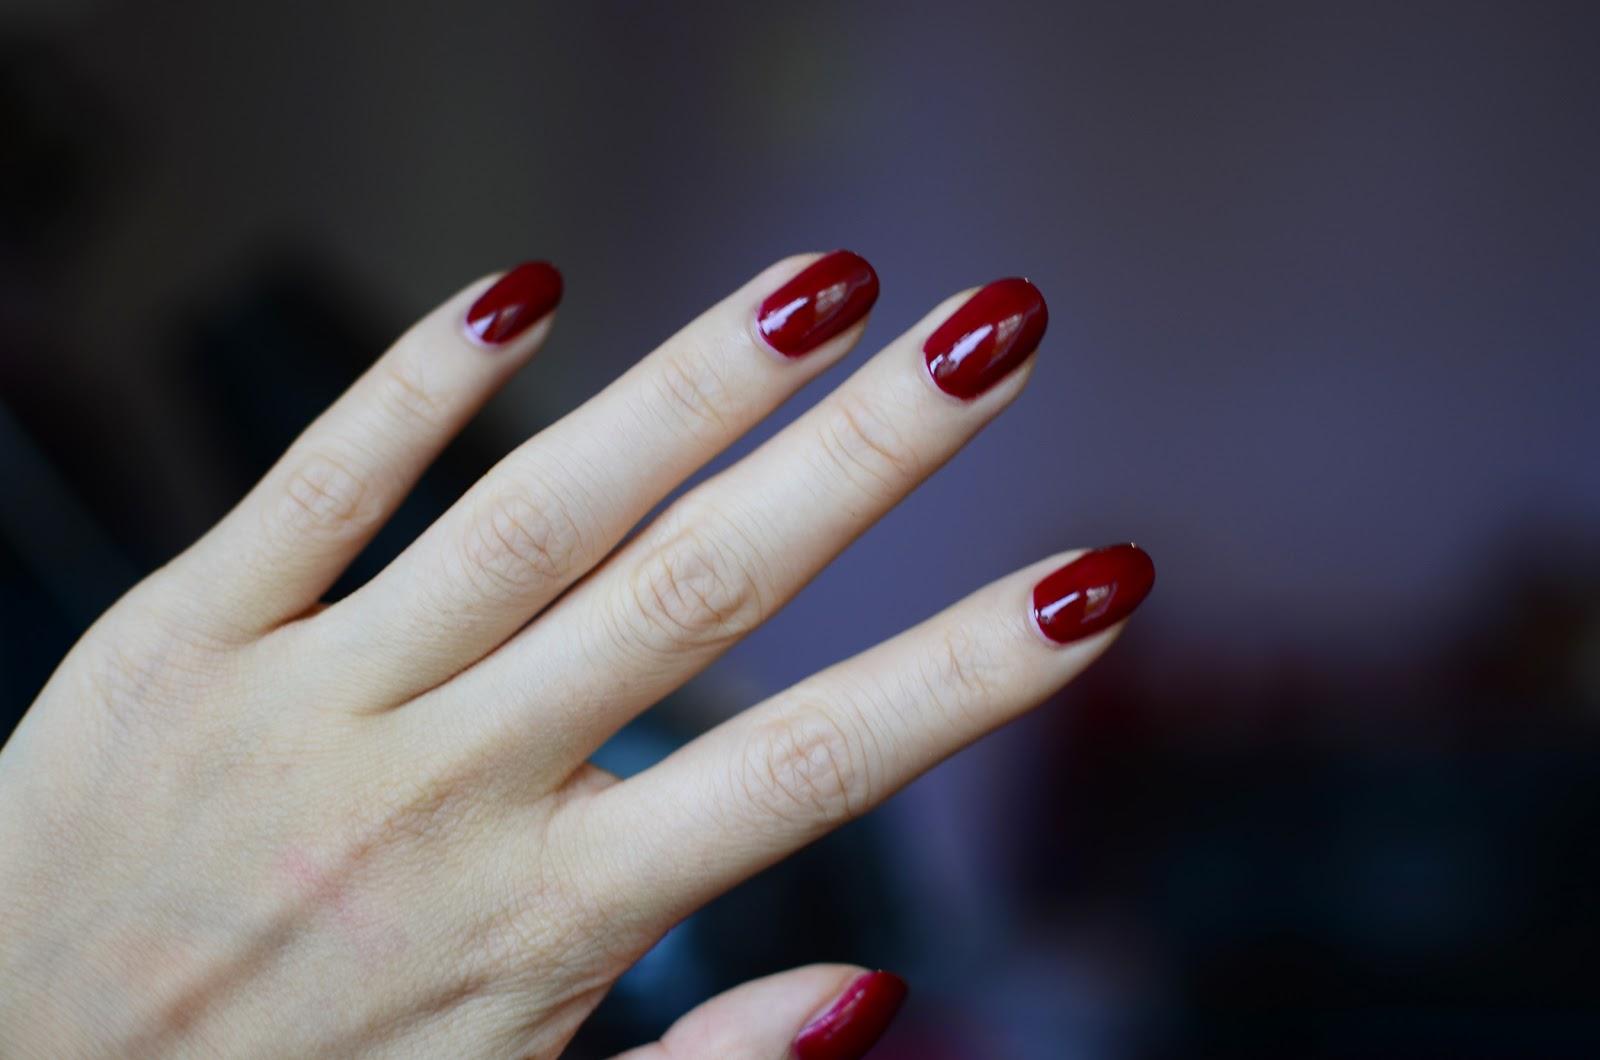 fun size beauty: The Body Shop Colour Crush Nail Polishes [Crimson ...